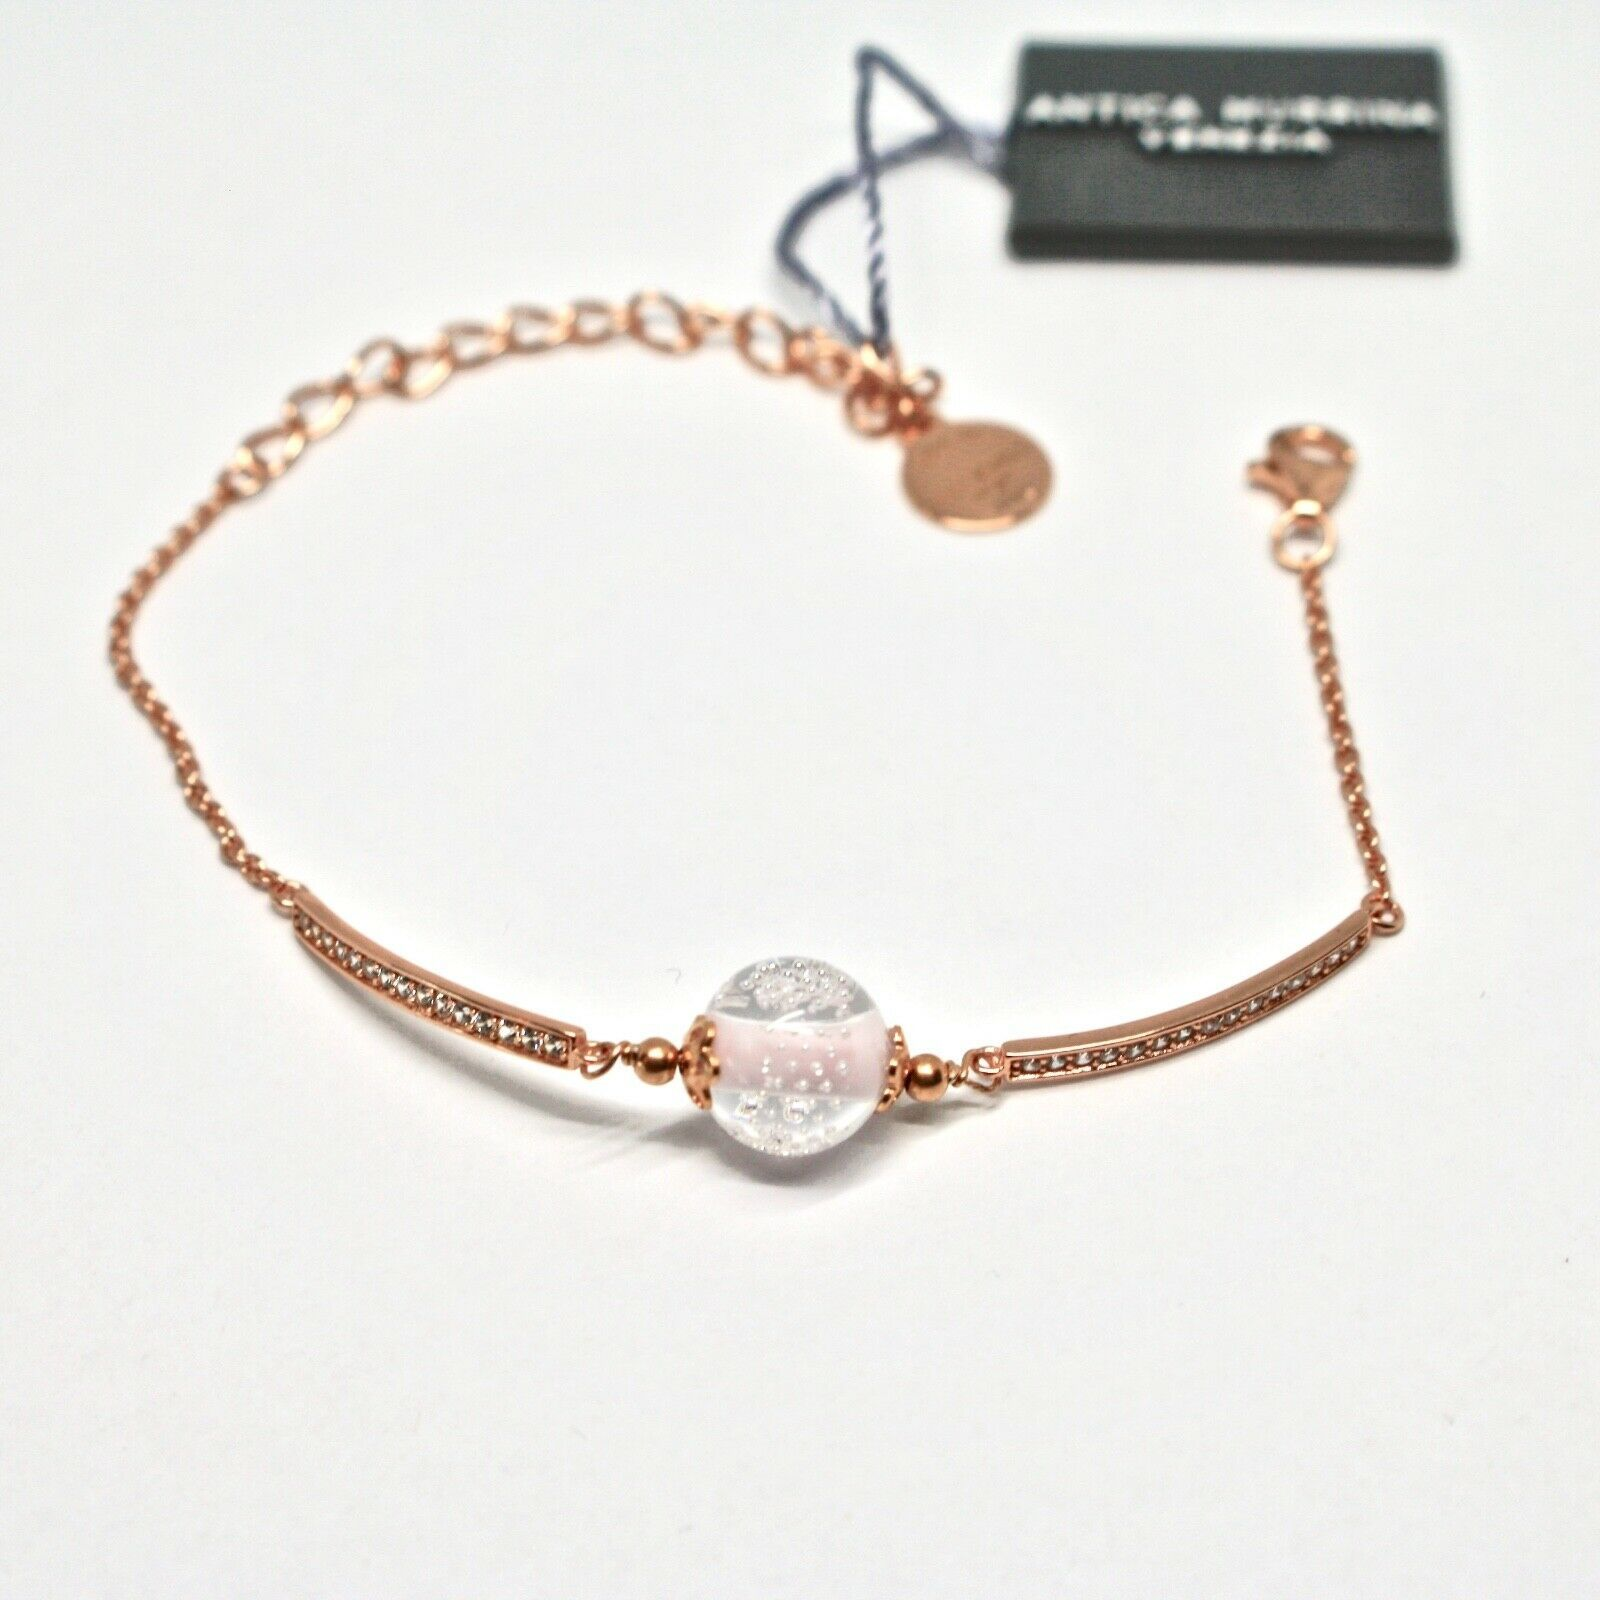 Bracelet Antica Murrina Venezia Silver 925 and Murano Glass AMVJWBT009C03